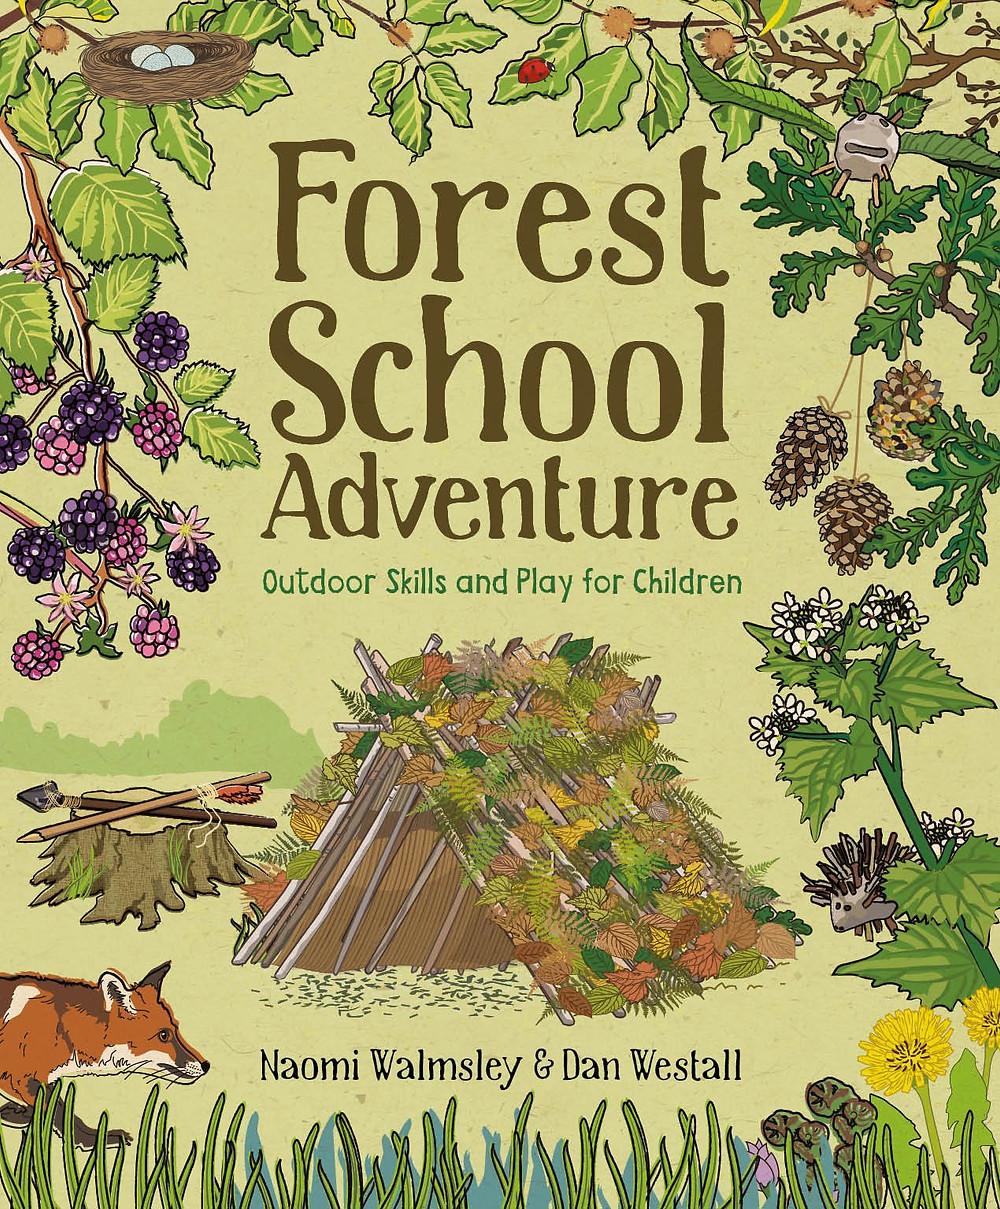 book - forest school adventure